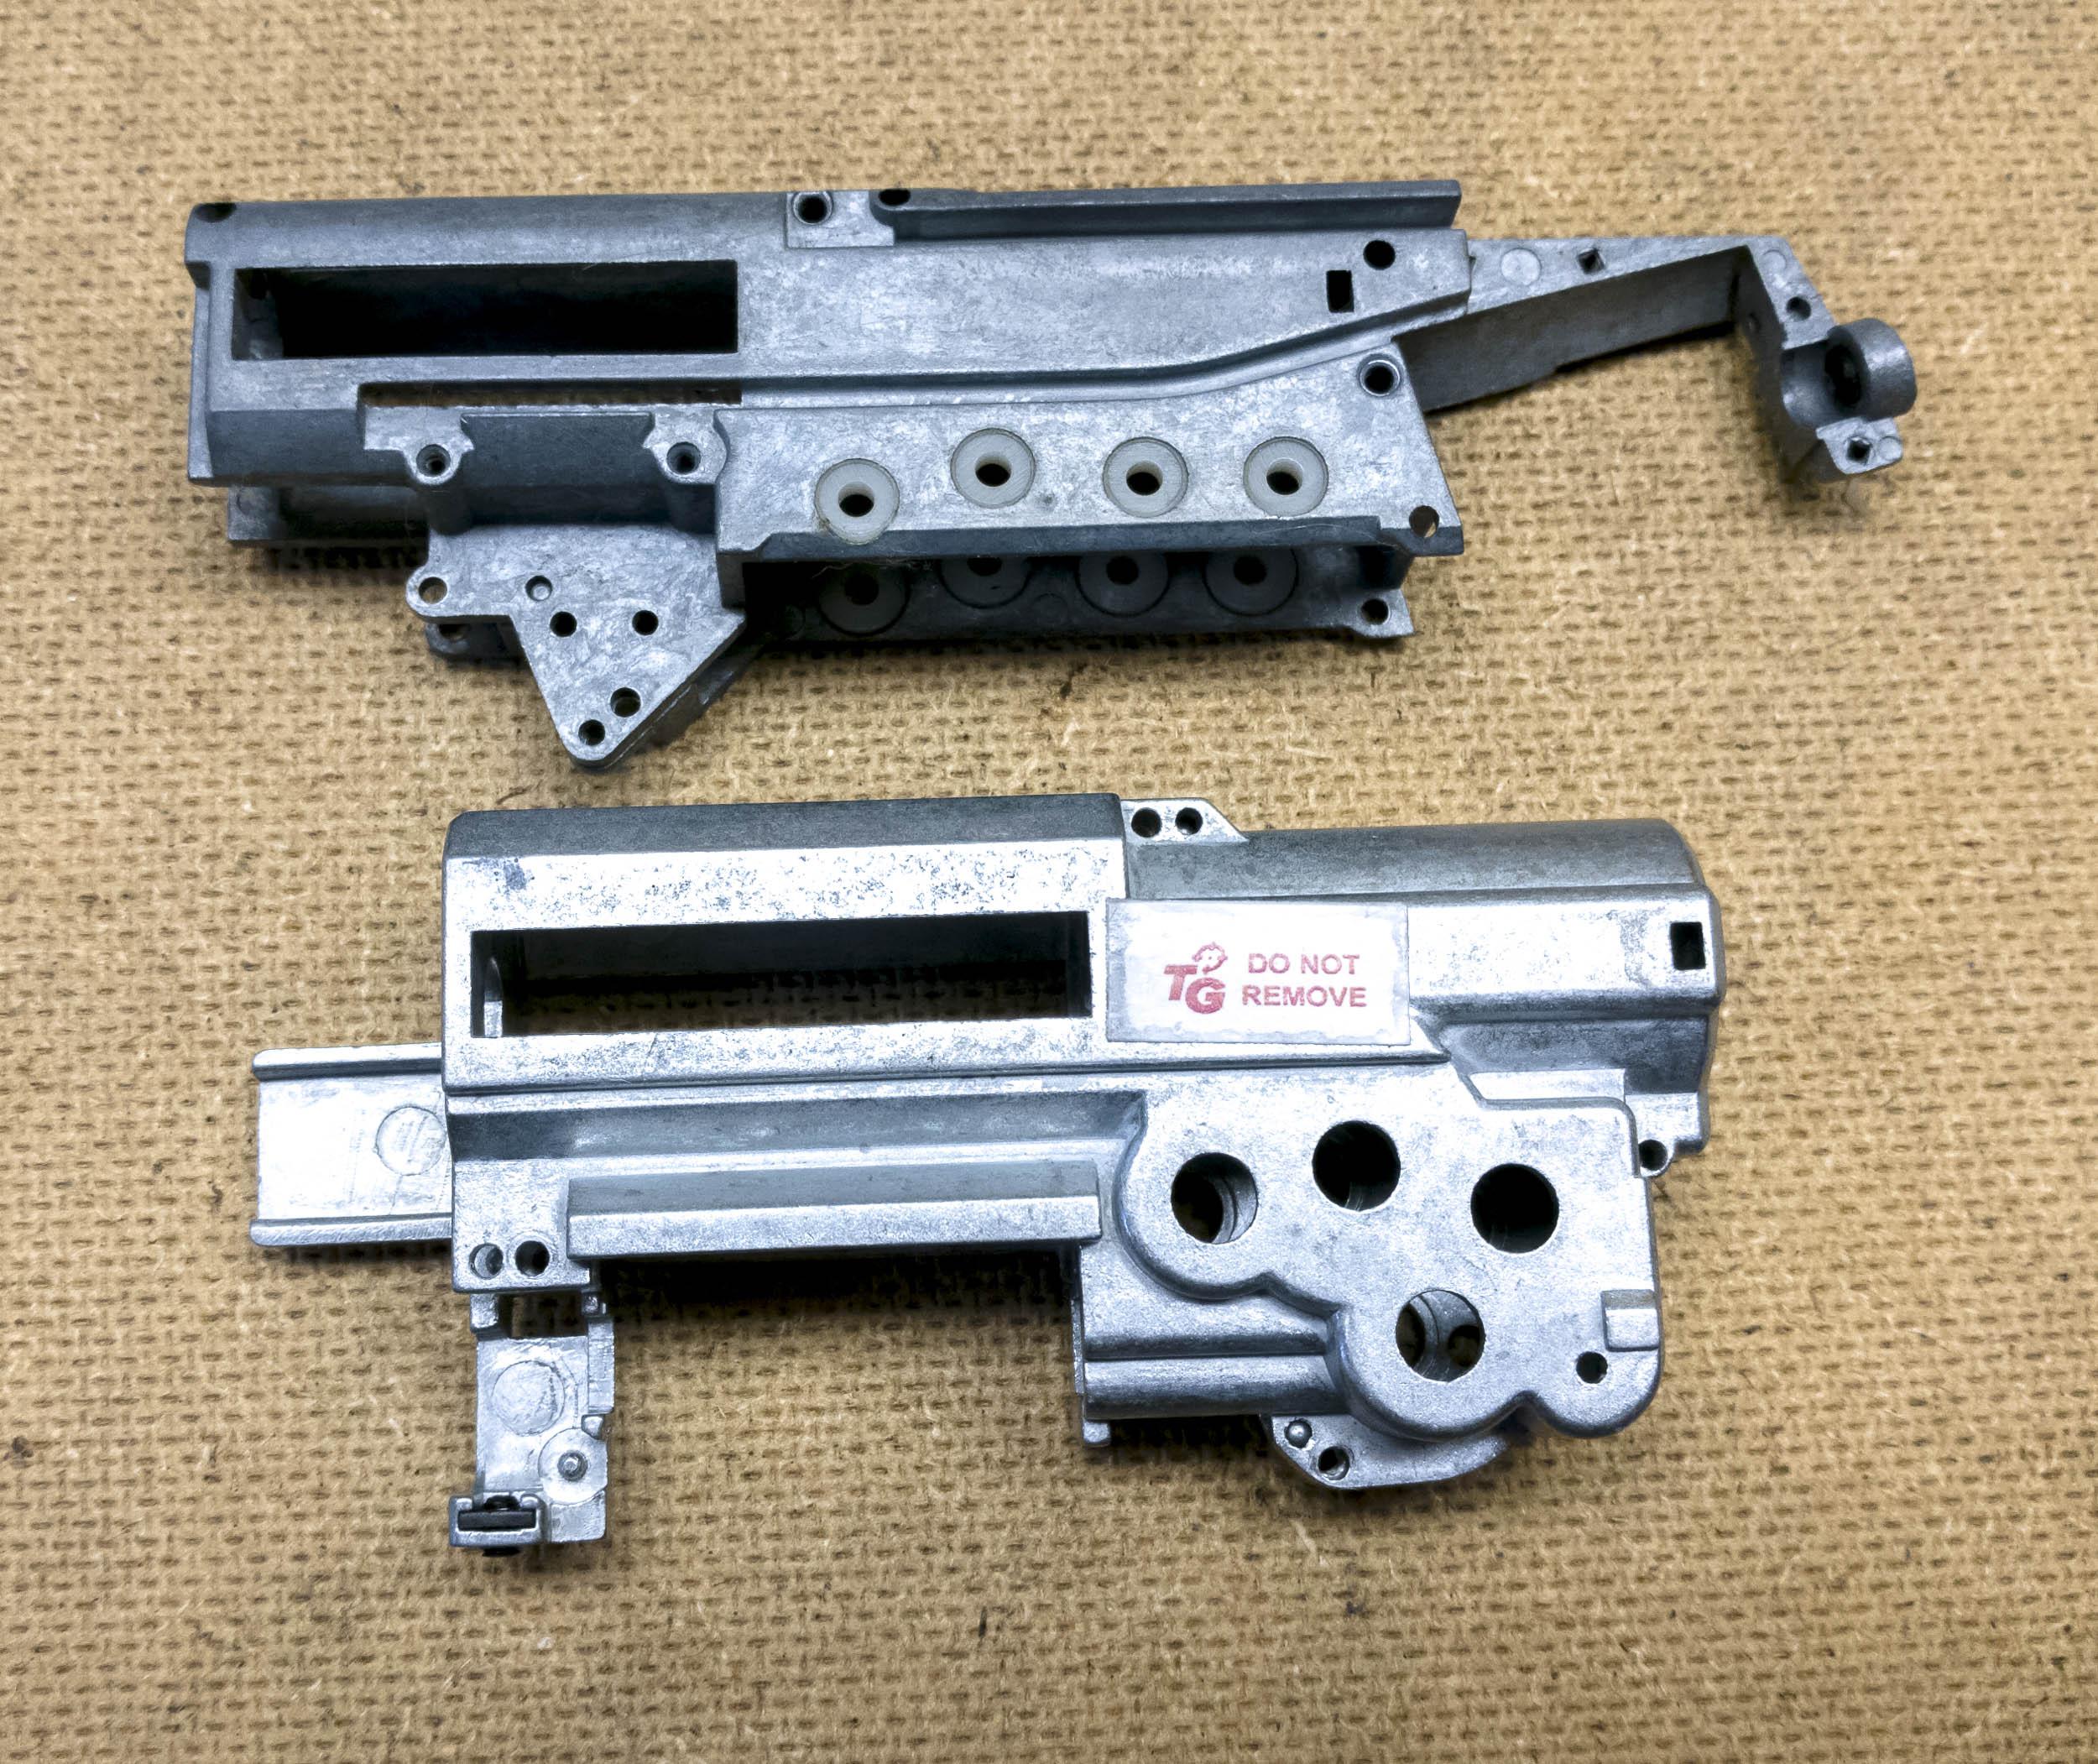 smg_vs_pistol_4.jpg